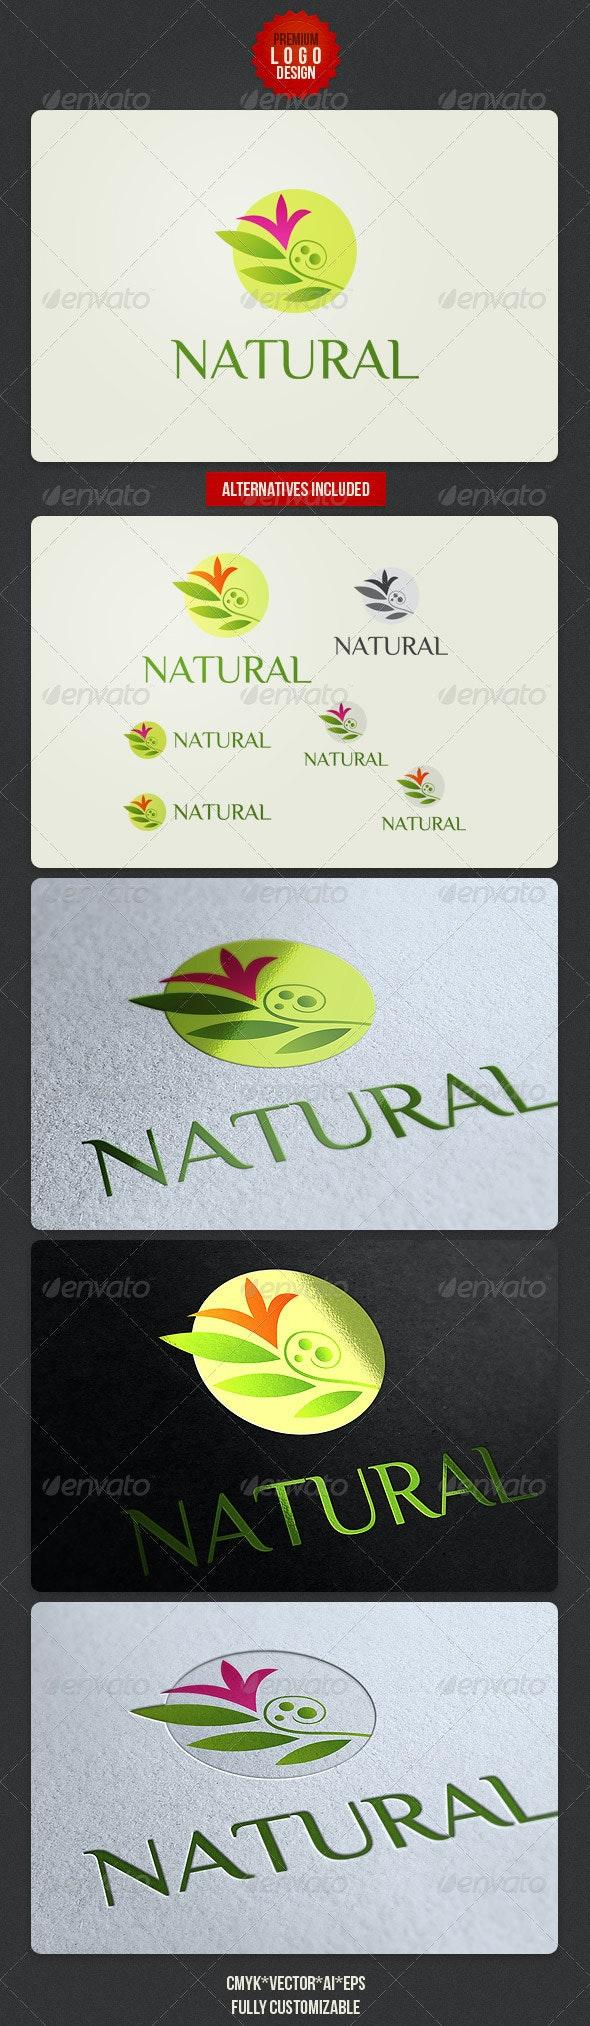 Clean Natural Logo Design - Nature Logo Templates